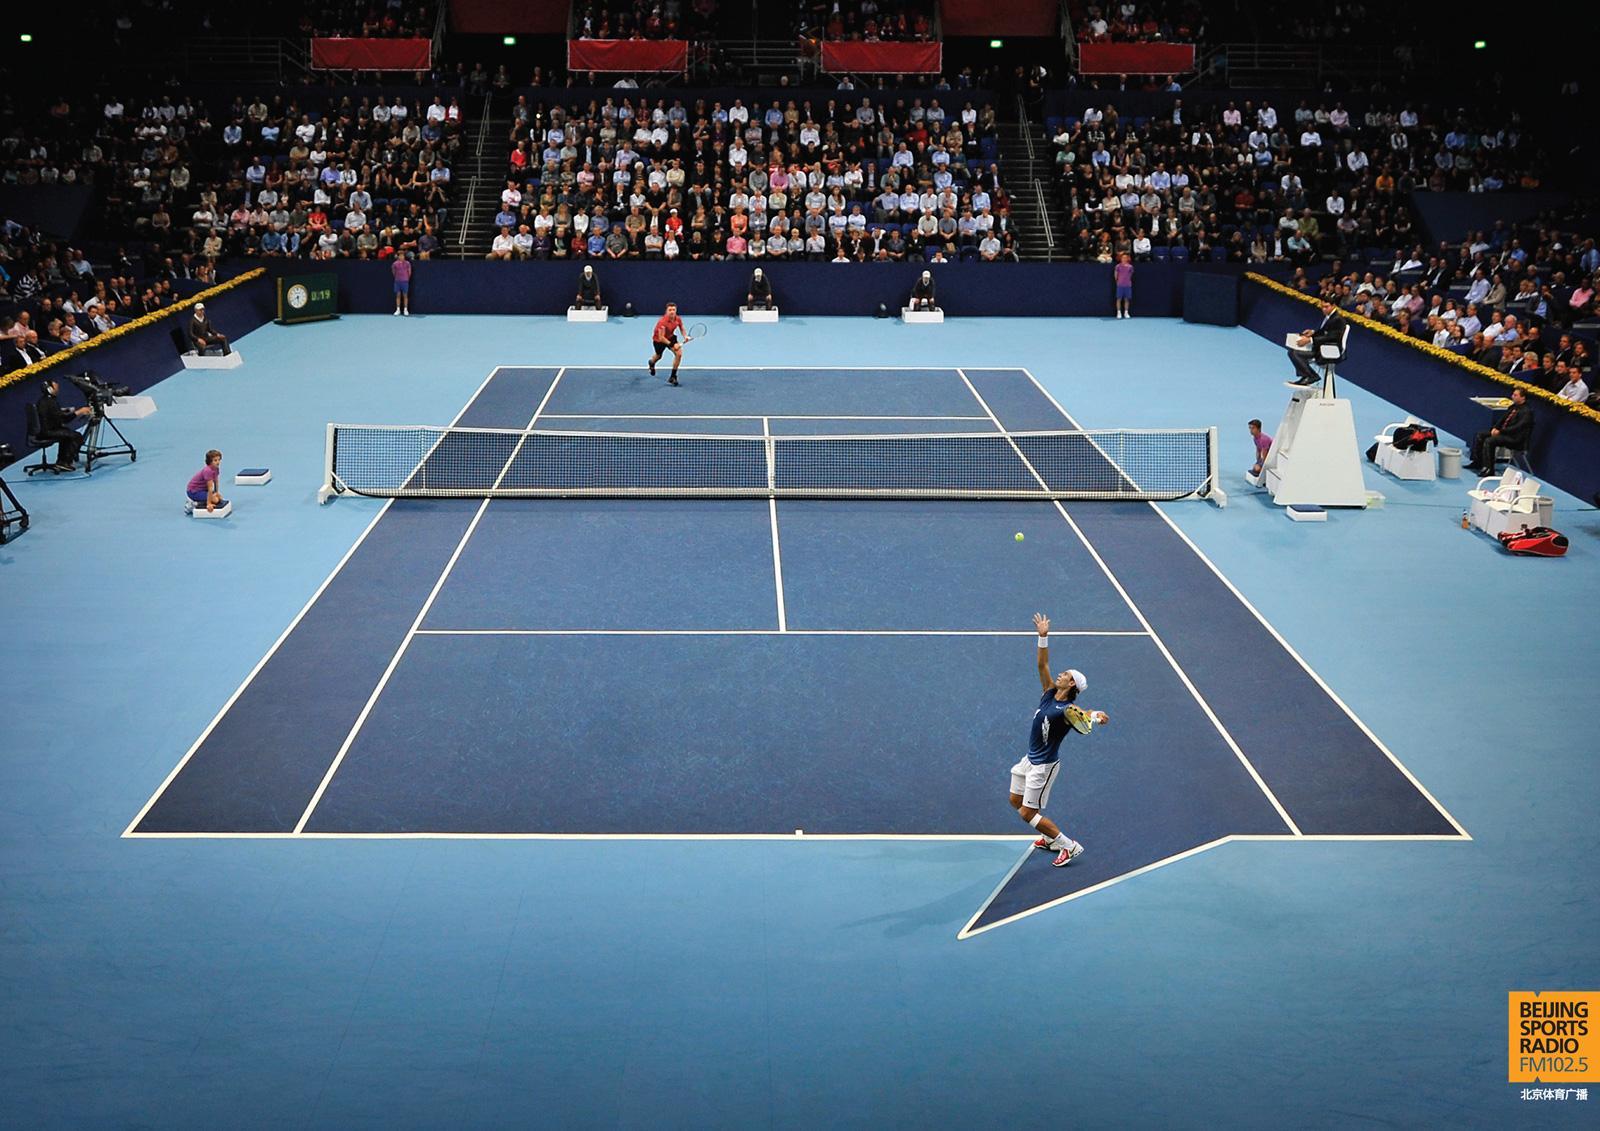 Beijing Sports Radio: Tennis   Ads of the World™